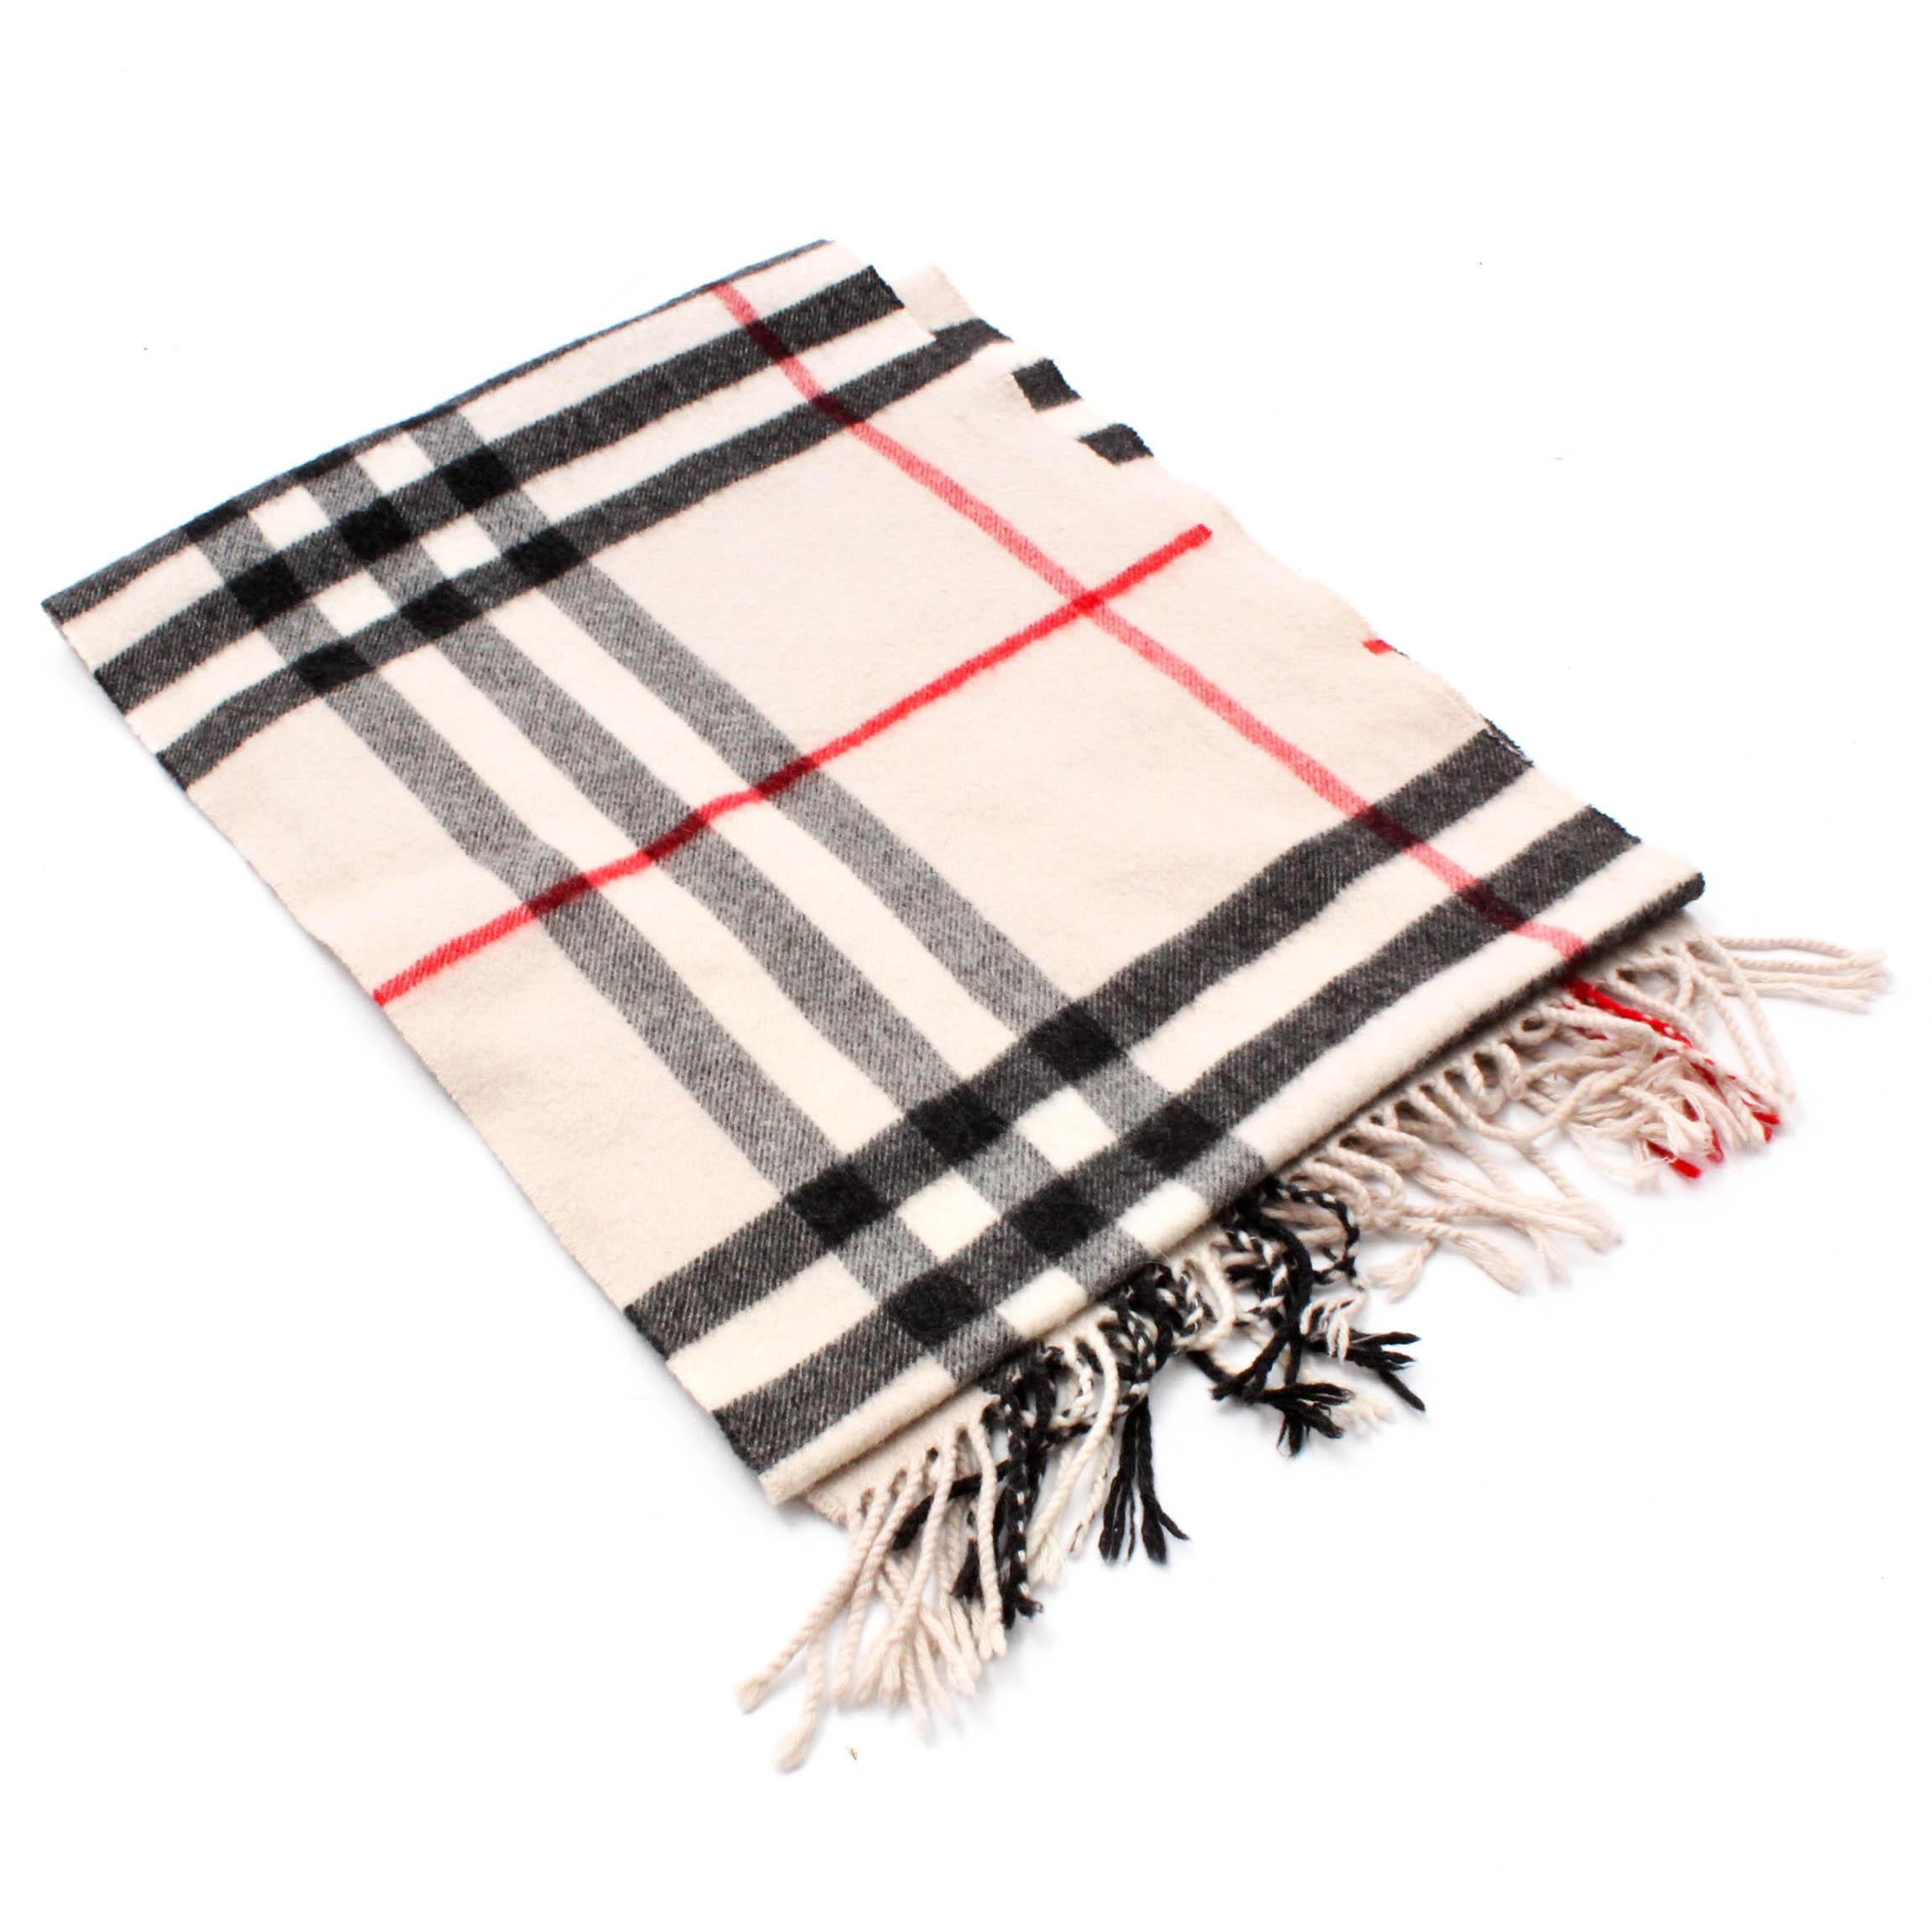 14f9c273c998 ... ireland burberry nova check cashmere scarf with fringe made in scotland  2e692 cdfe0